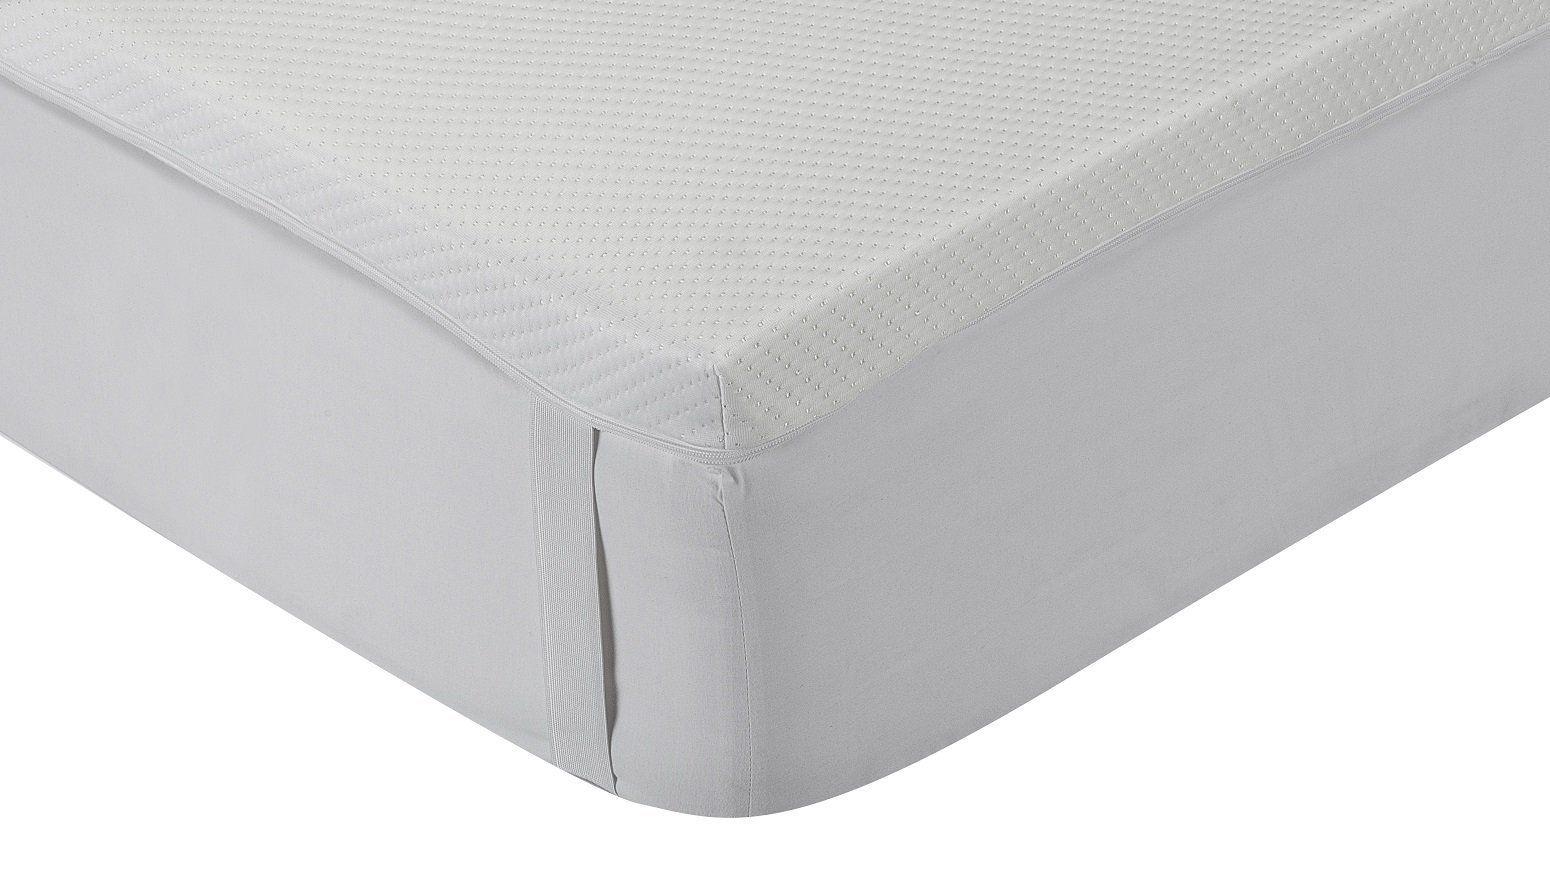 Classic Blanc Surmatelas En Mousse A Memoire Aloe Vera Confort Medium Epaisseur 5cm In 2020 Home Decor Furniture Decor